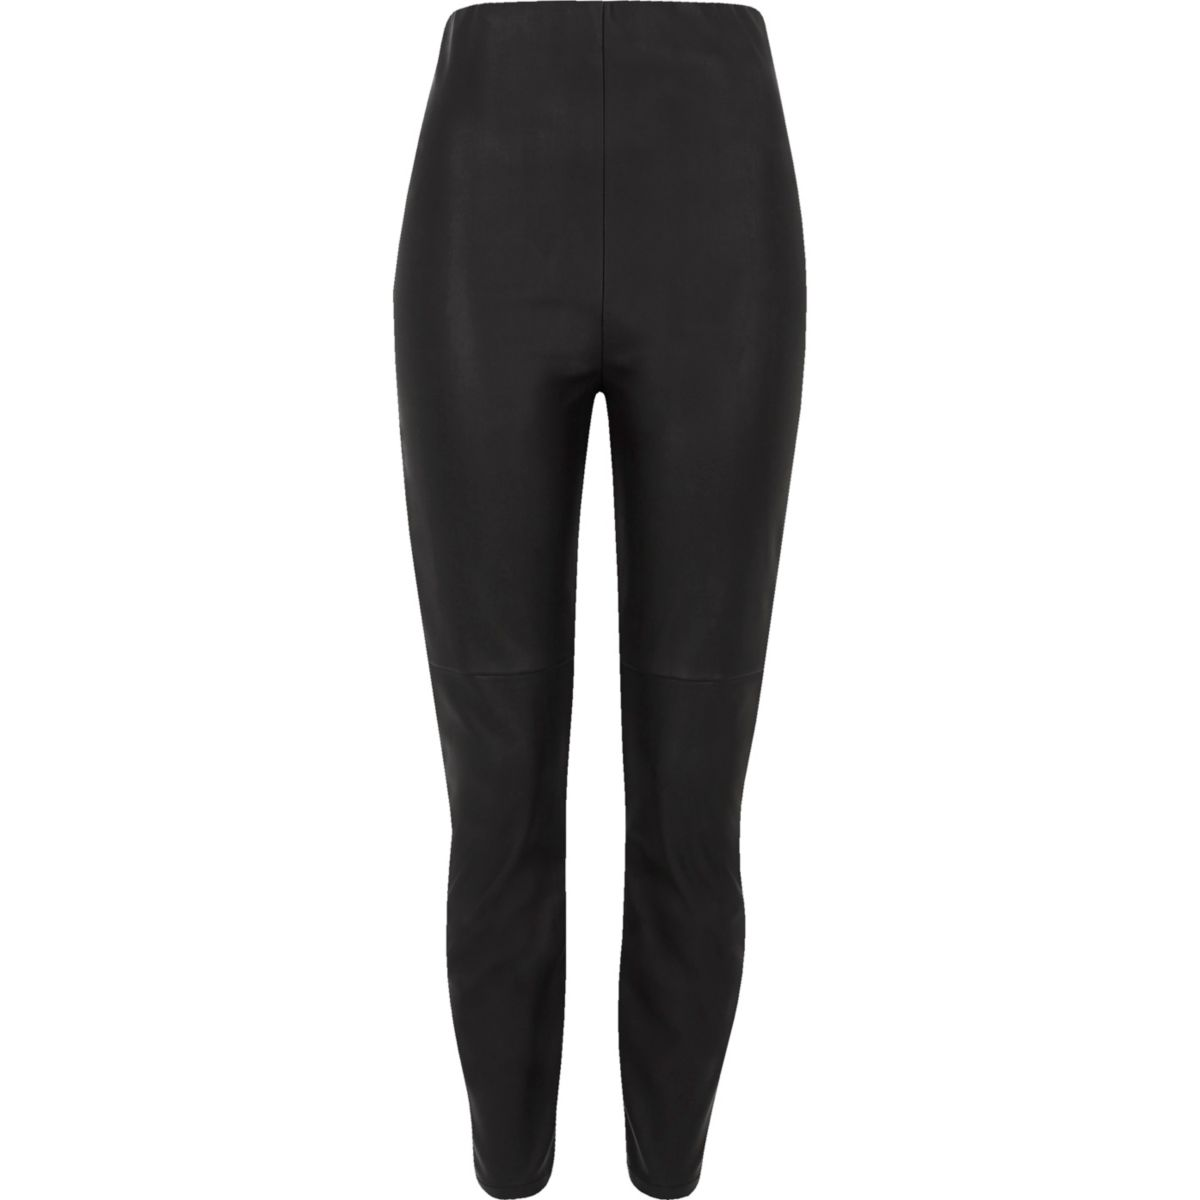 Schwarze Skinny Hose aus Lederimitat